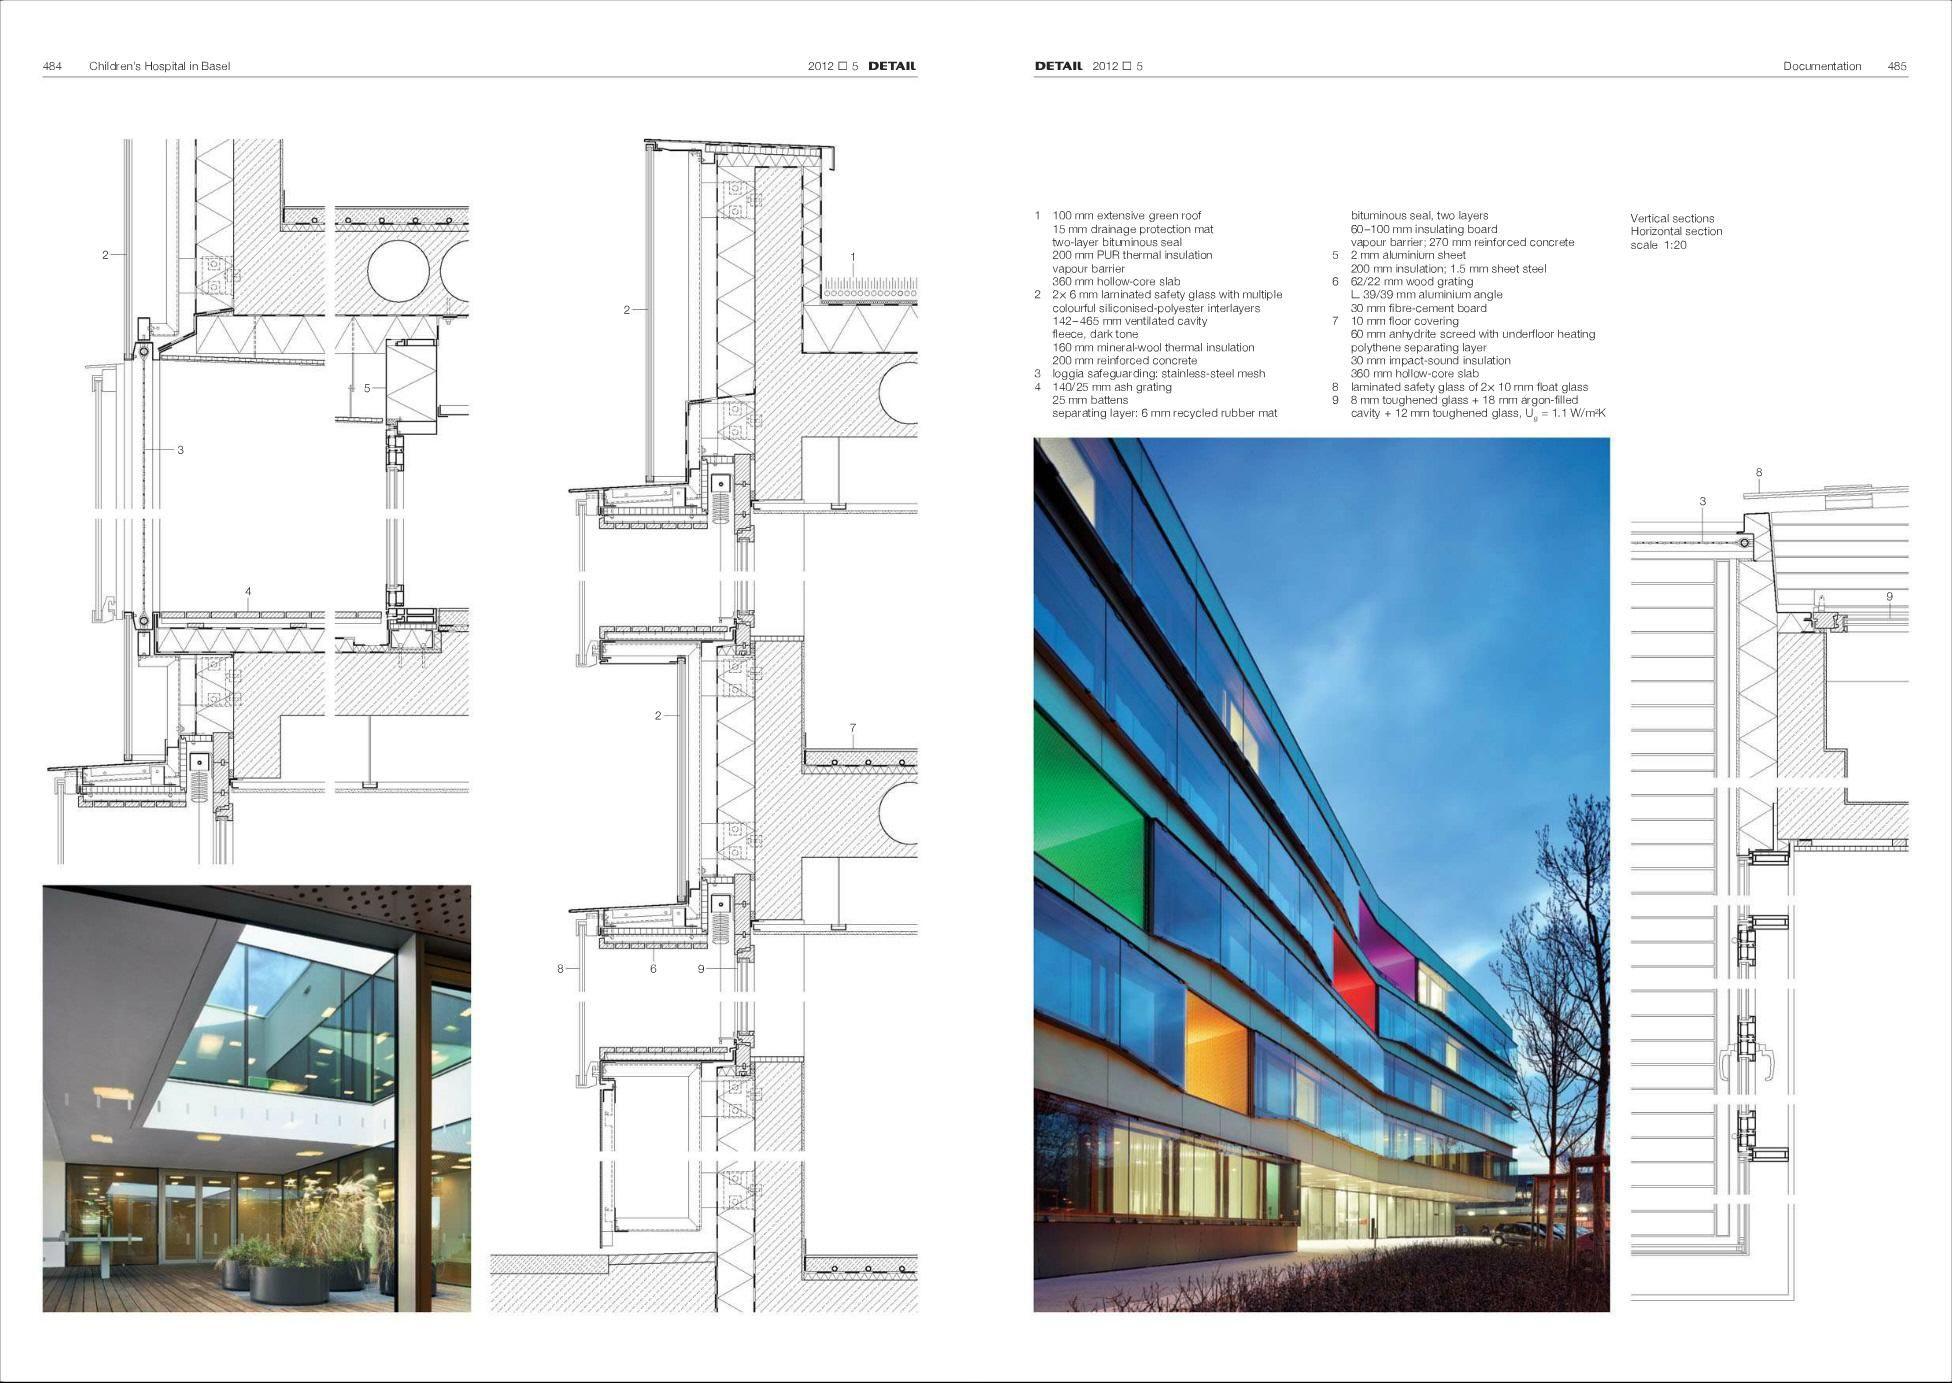 Detail magazine 2012 09 10 483485 Architectural Details